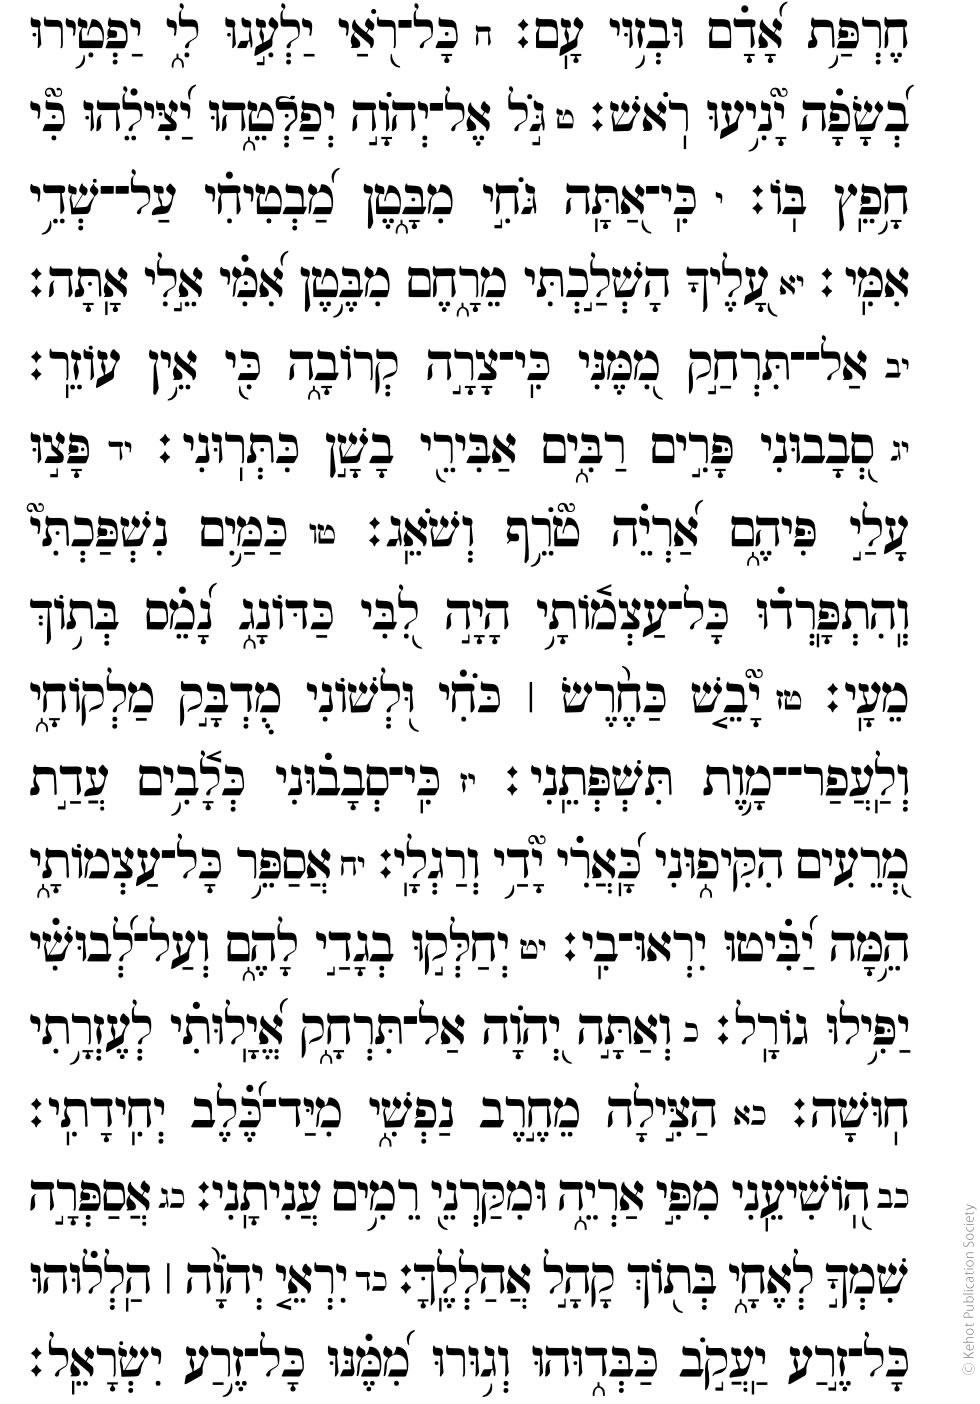 Chapter 22 - Prayer